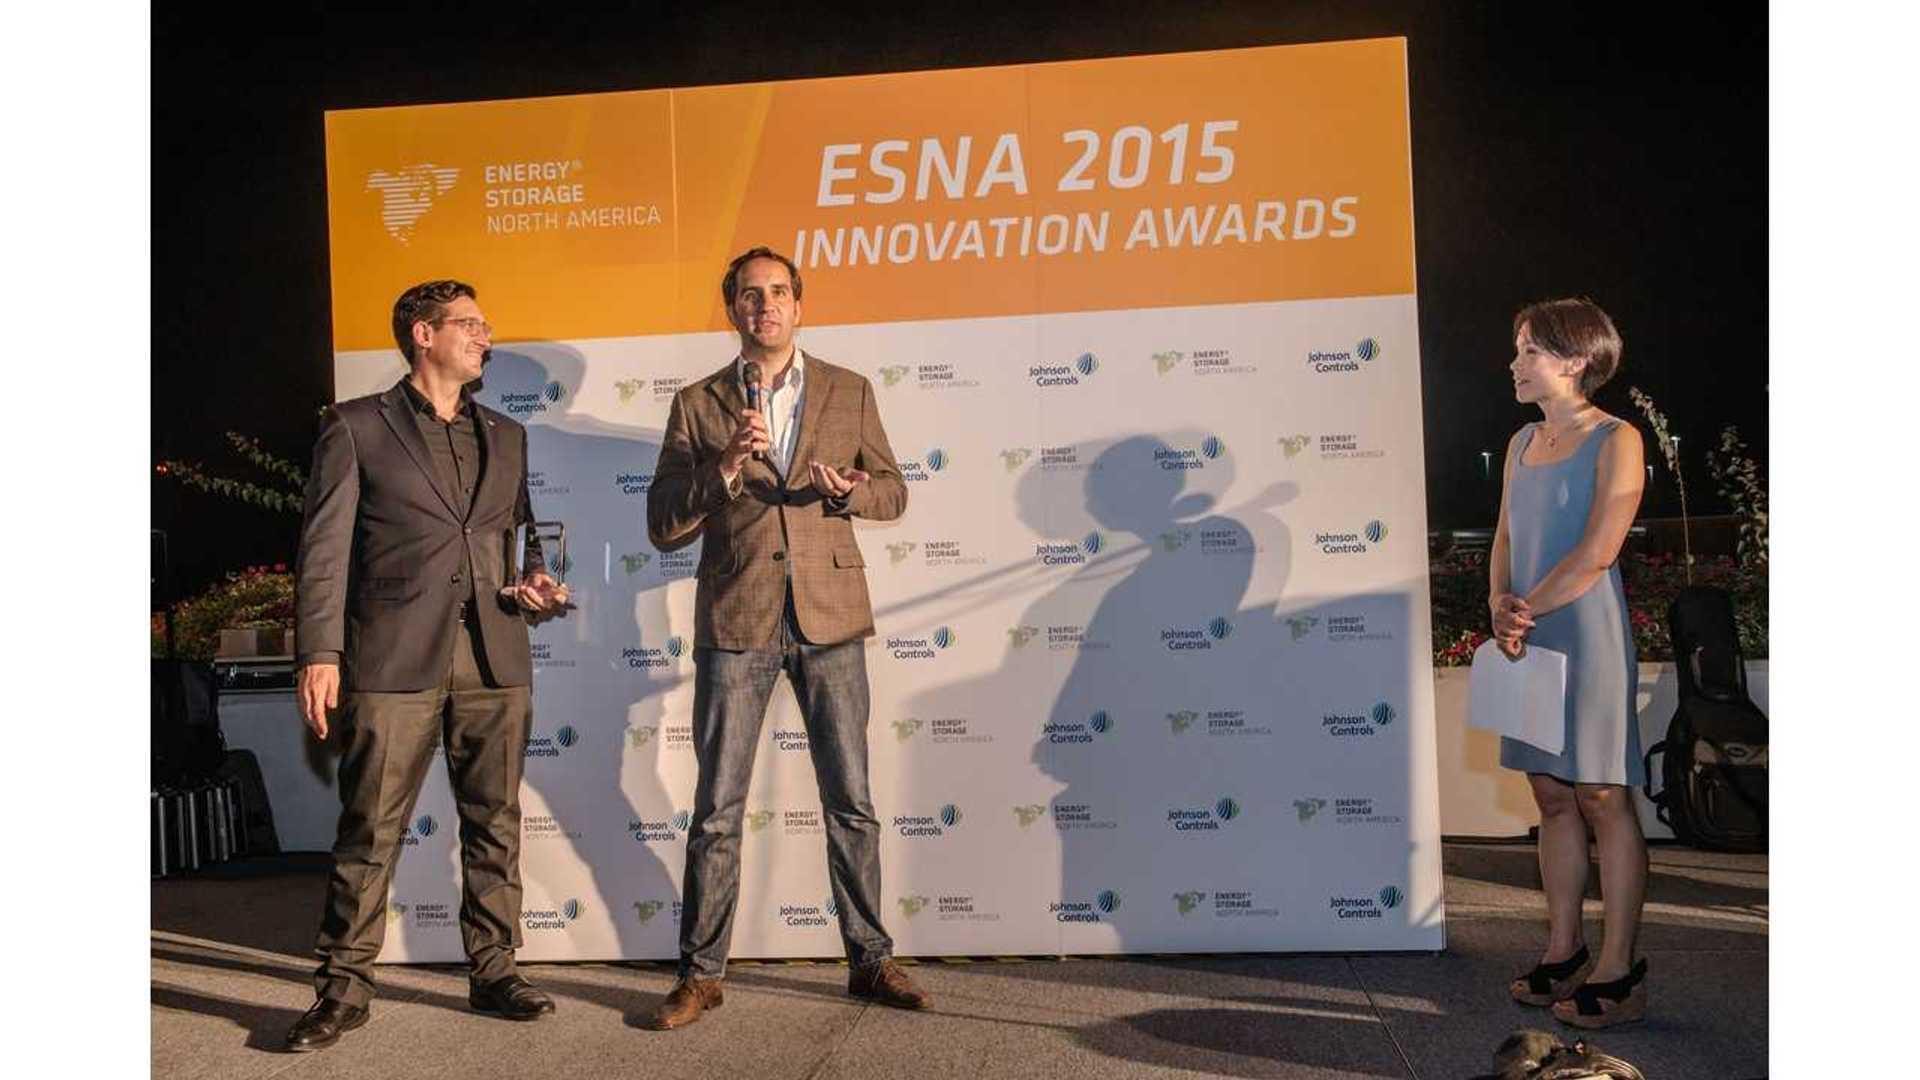 BMW Wins 2015 Energy Storage North America Innovation Award